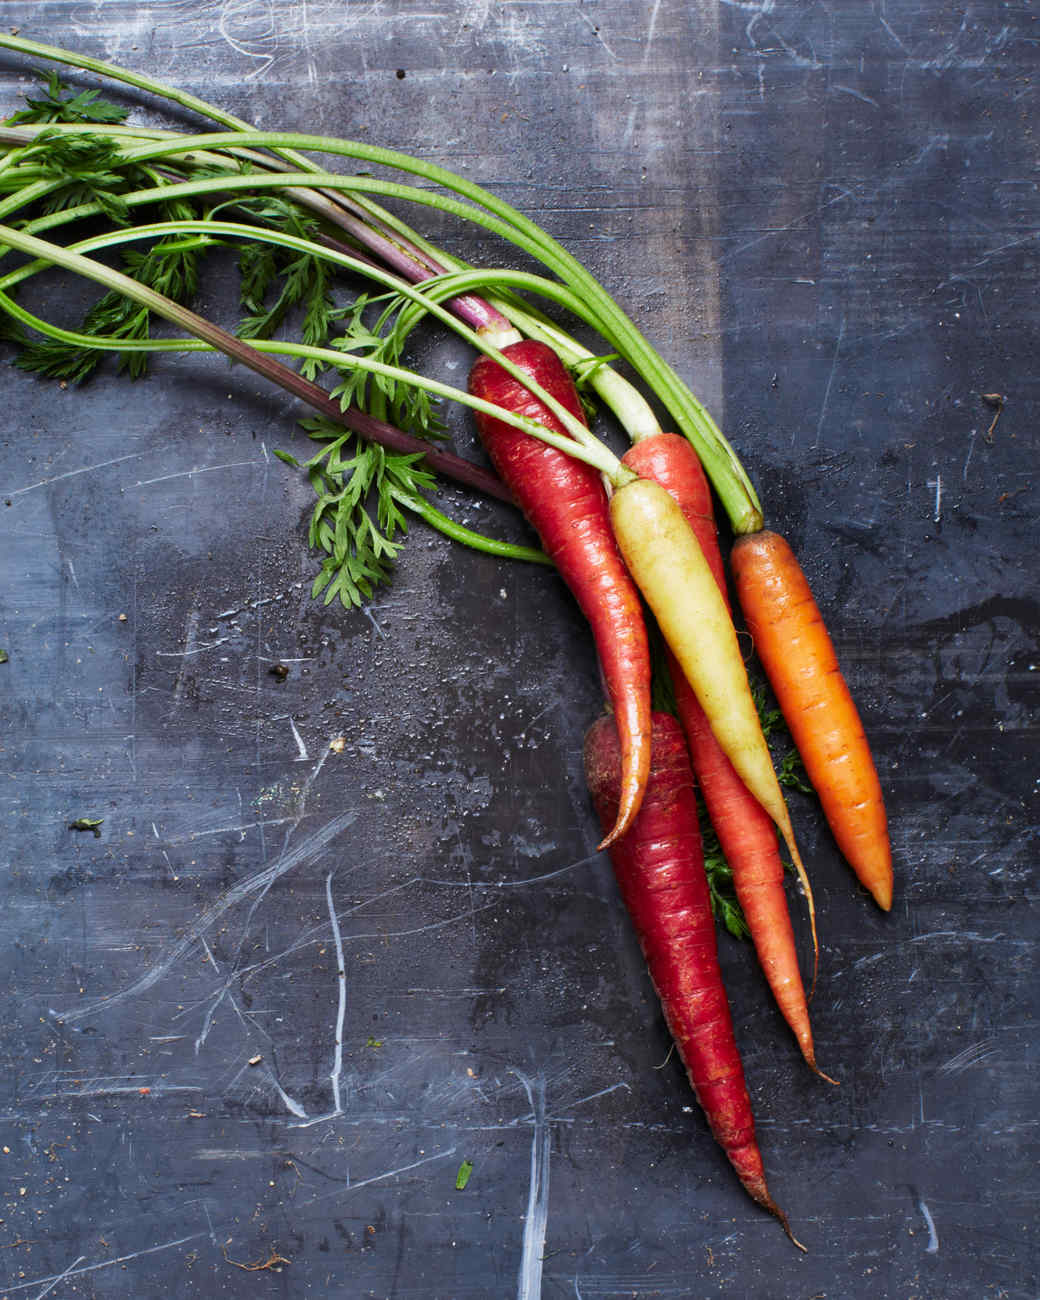 carrot-roots-tubers-206-d110486.jpg